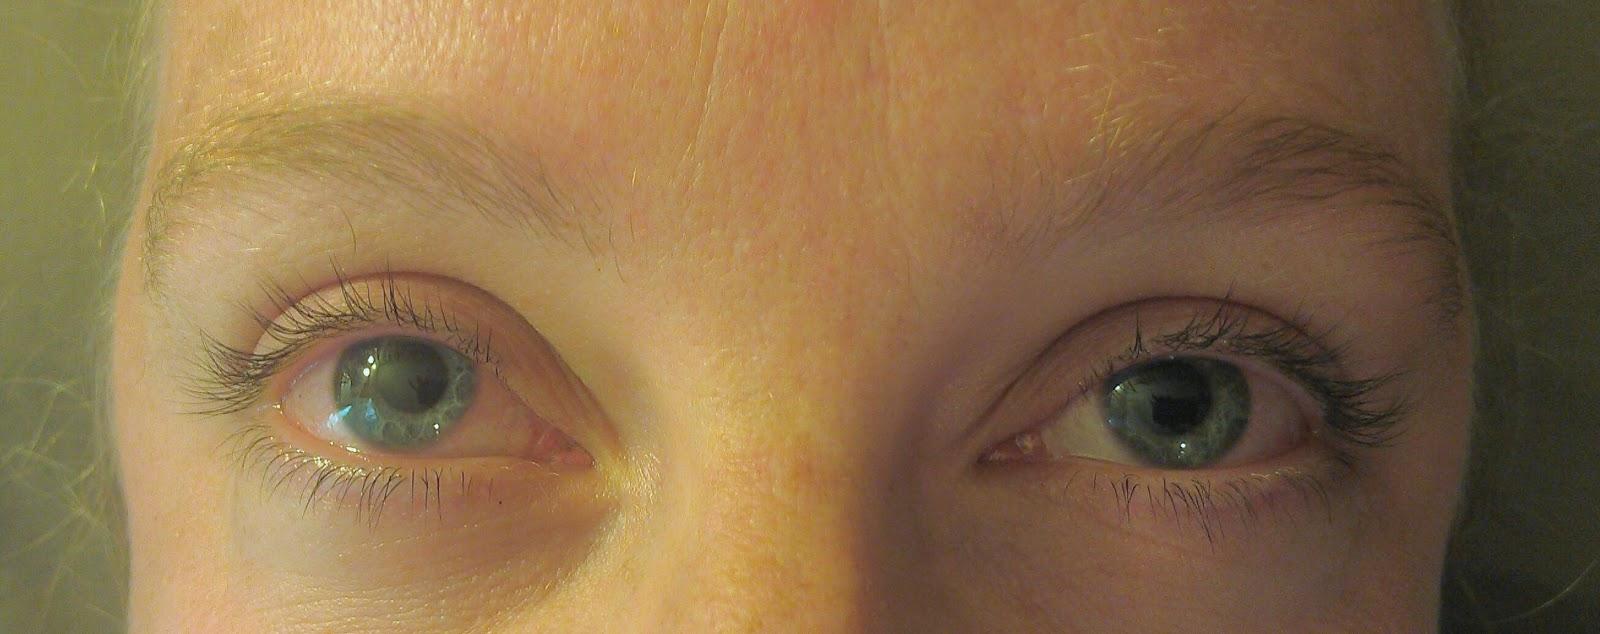 Salon Sovay: Lovely Eyelash Tint and Eyebrow Tint for a Blonde